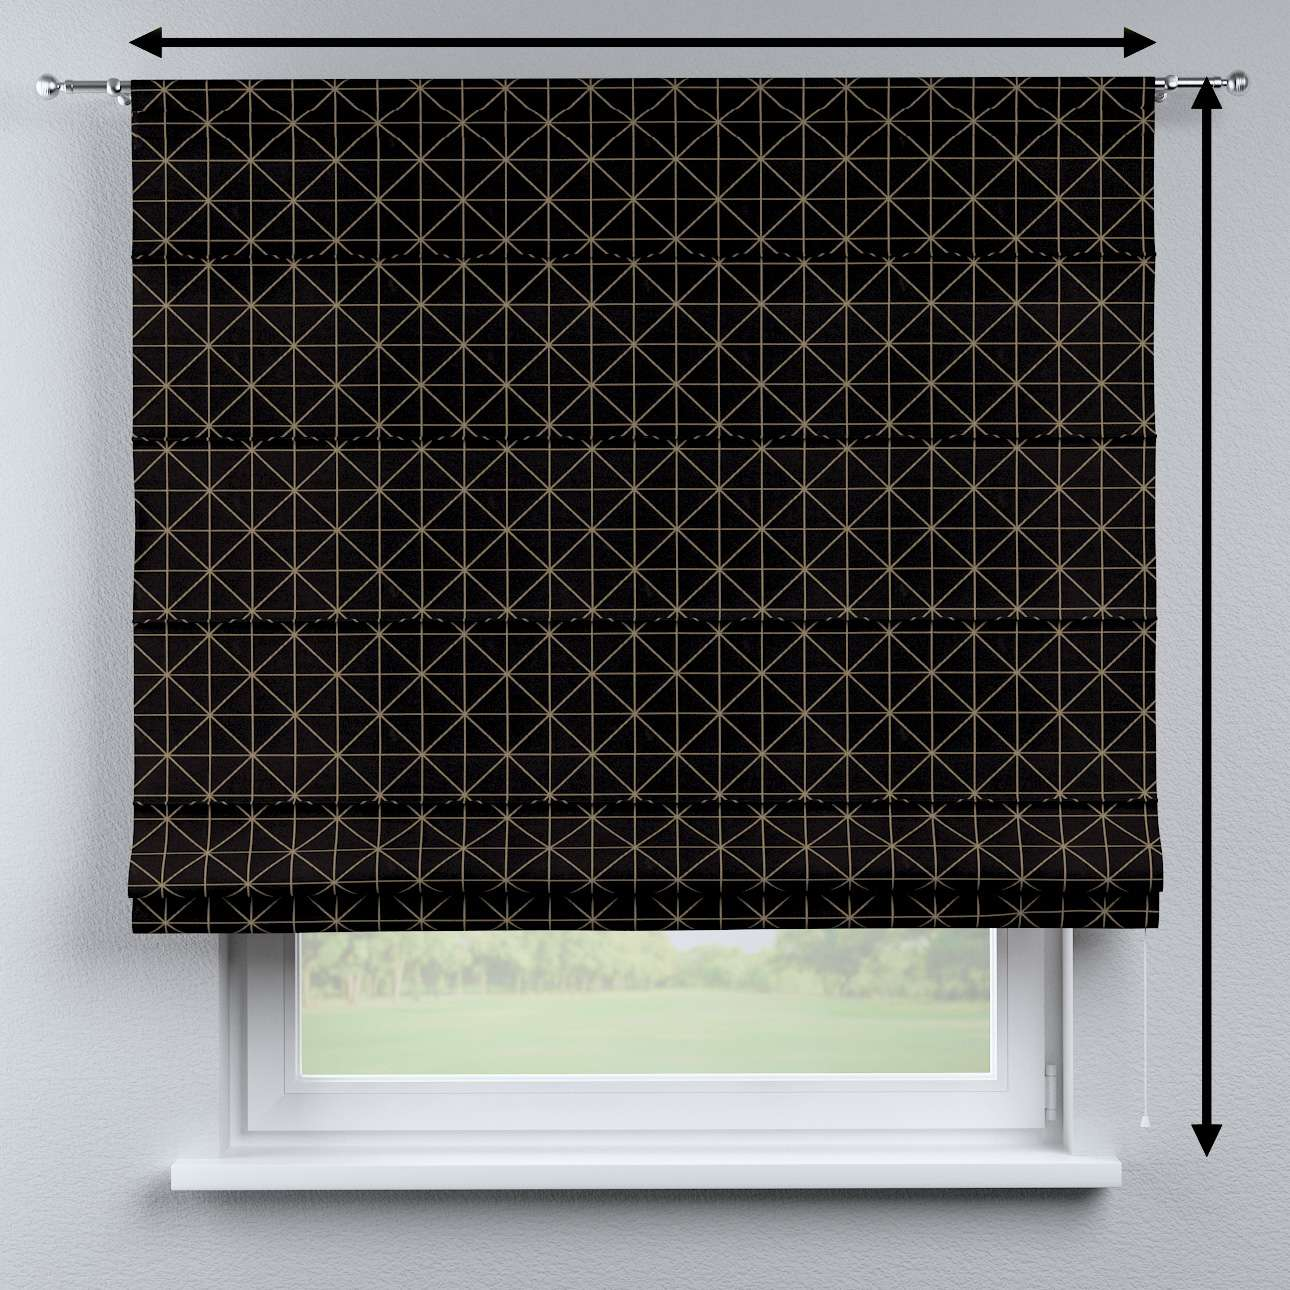 Vouwgordijn Torino van de collectie Black & White, Stof: 142-55